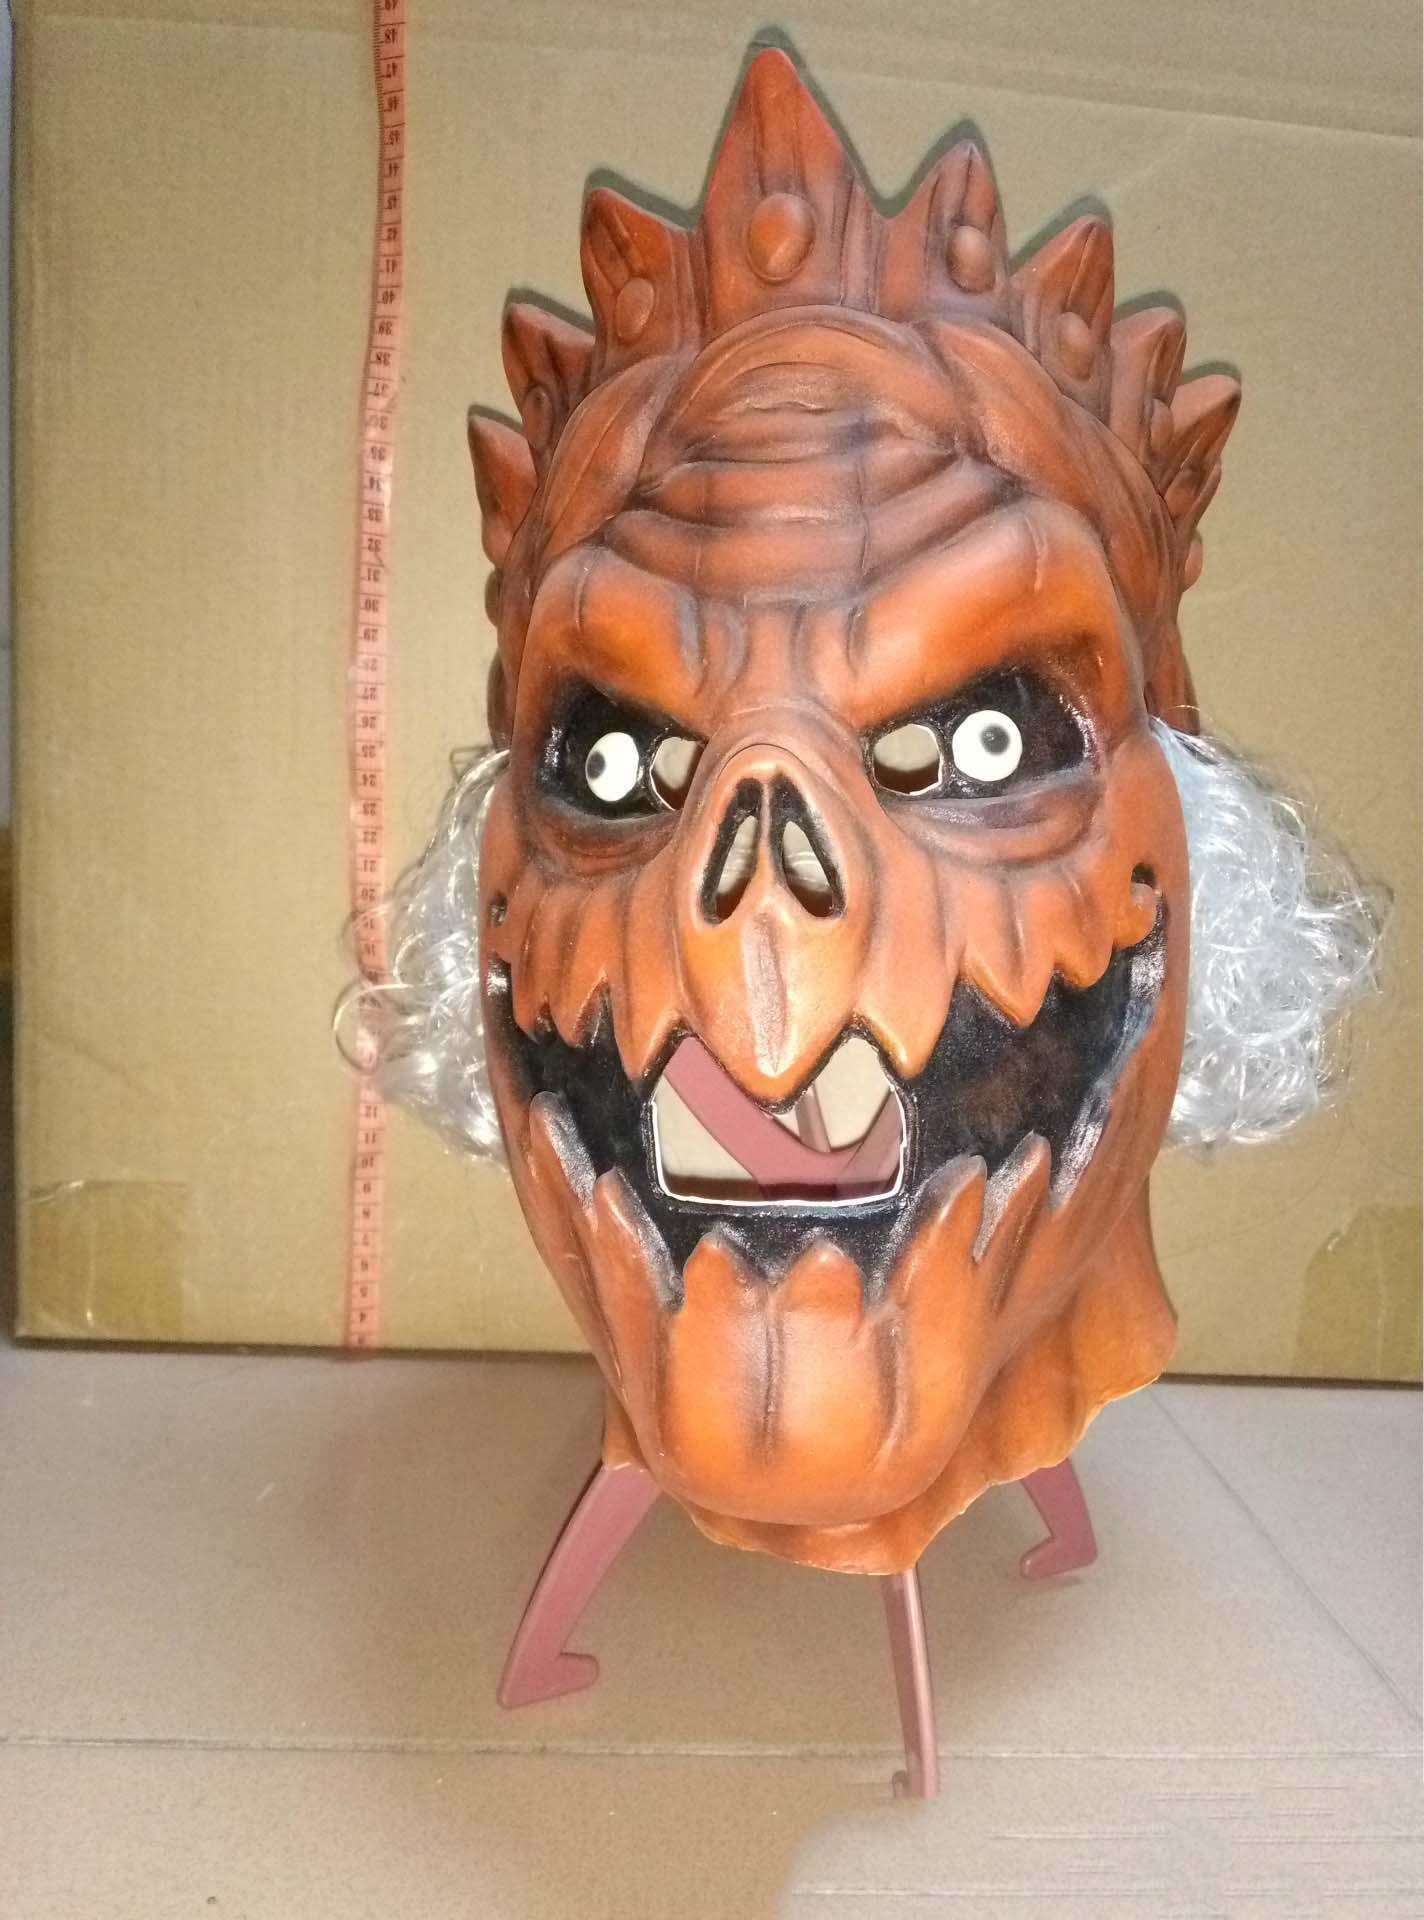 Halloween Mask Party Scarymask Scream Mask Costume Latex Pumpkin ...